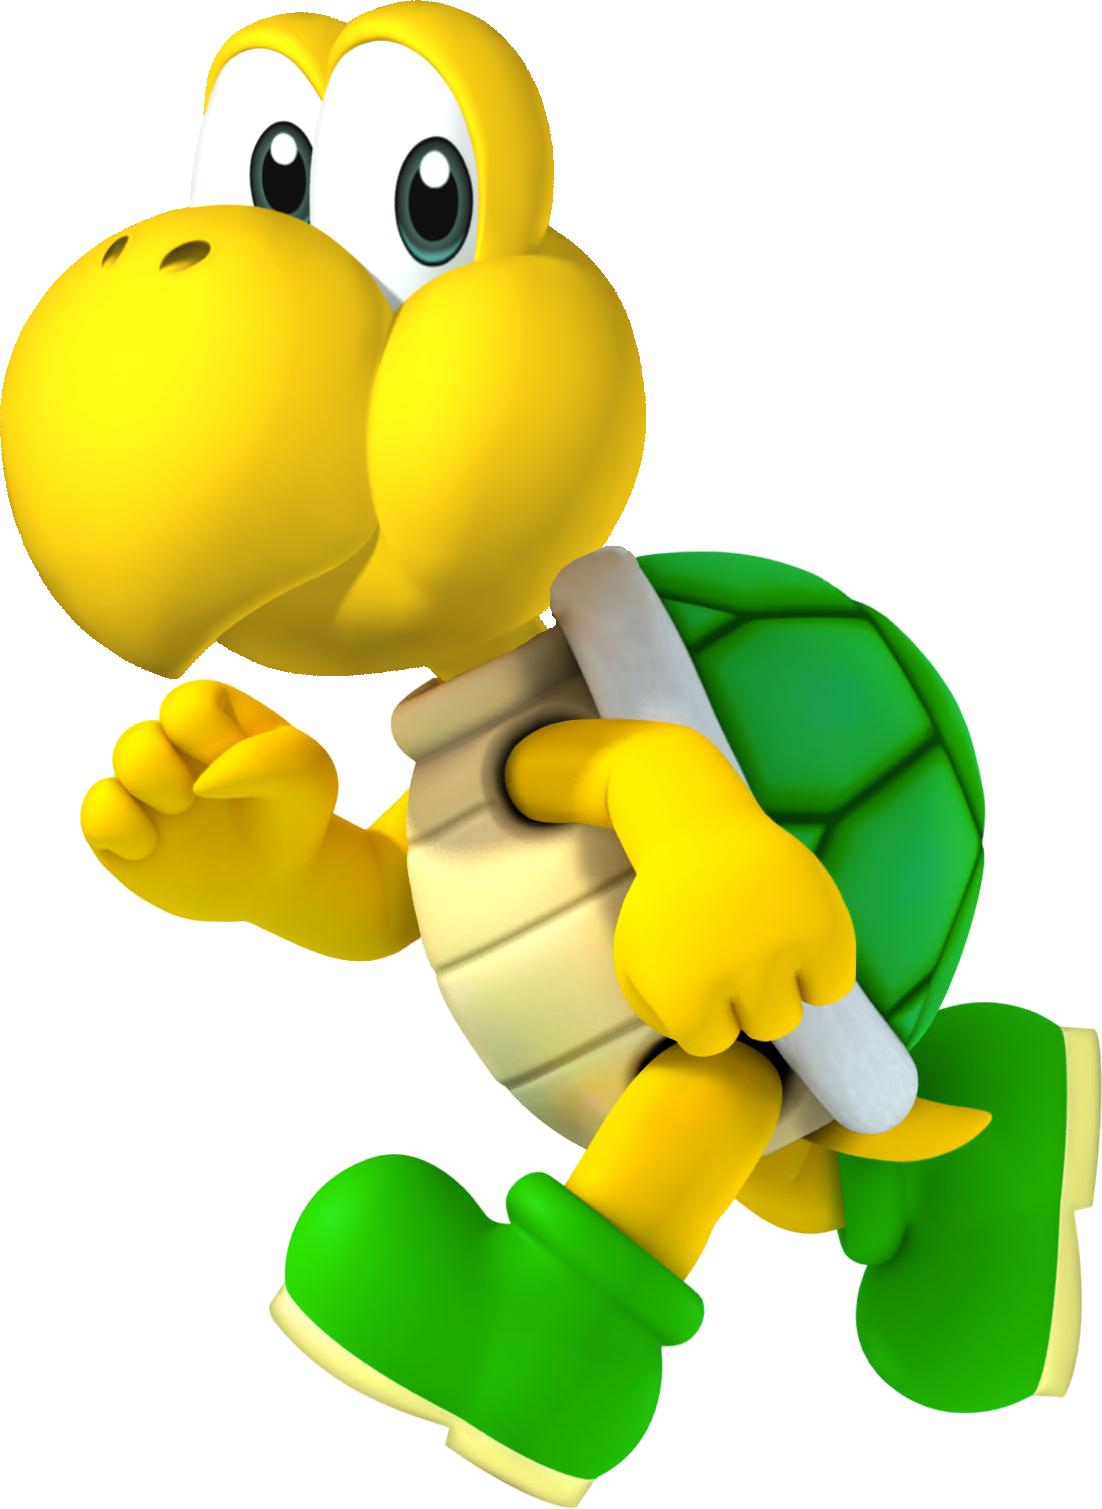 Image Koopa Troopa Smbu Png Fantendo Nintendo Fanon Wiki Fandom Powered By Wikia